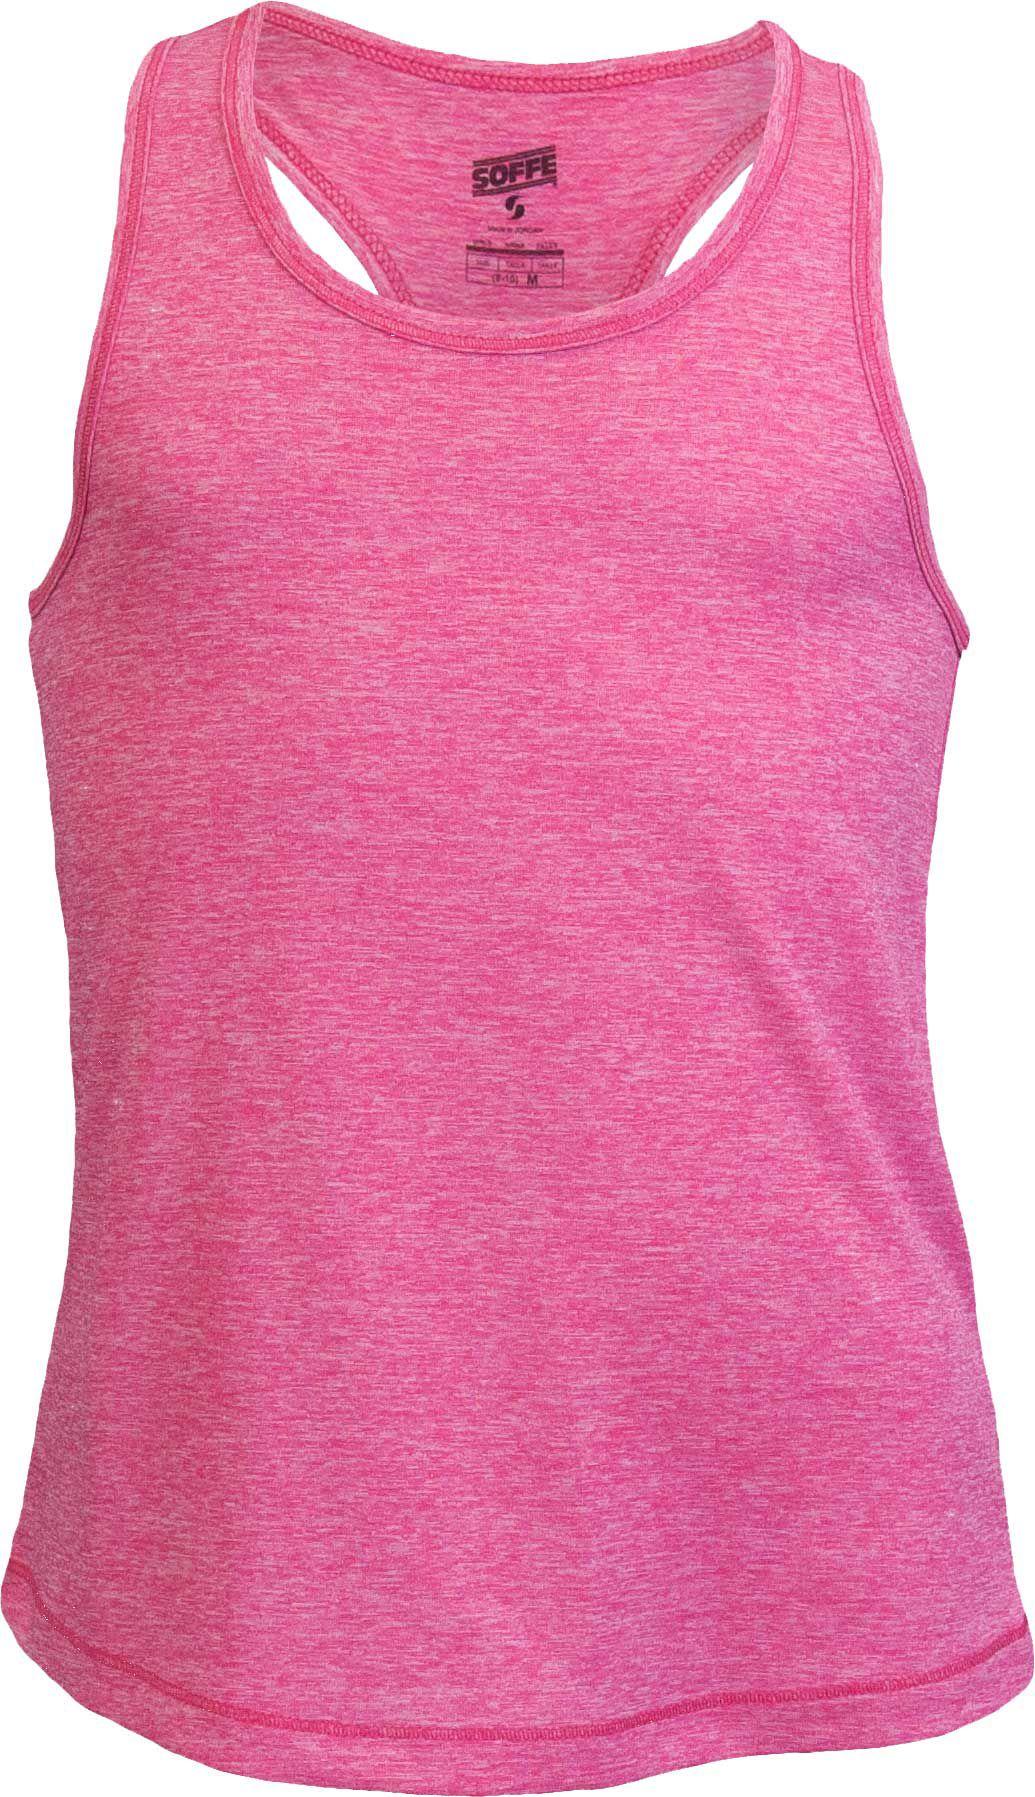 ab33ce71d9a0 Soffe Girls' Performance Racerback Tank Top, Size: Medium, Fuchsia Purple  Heather